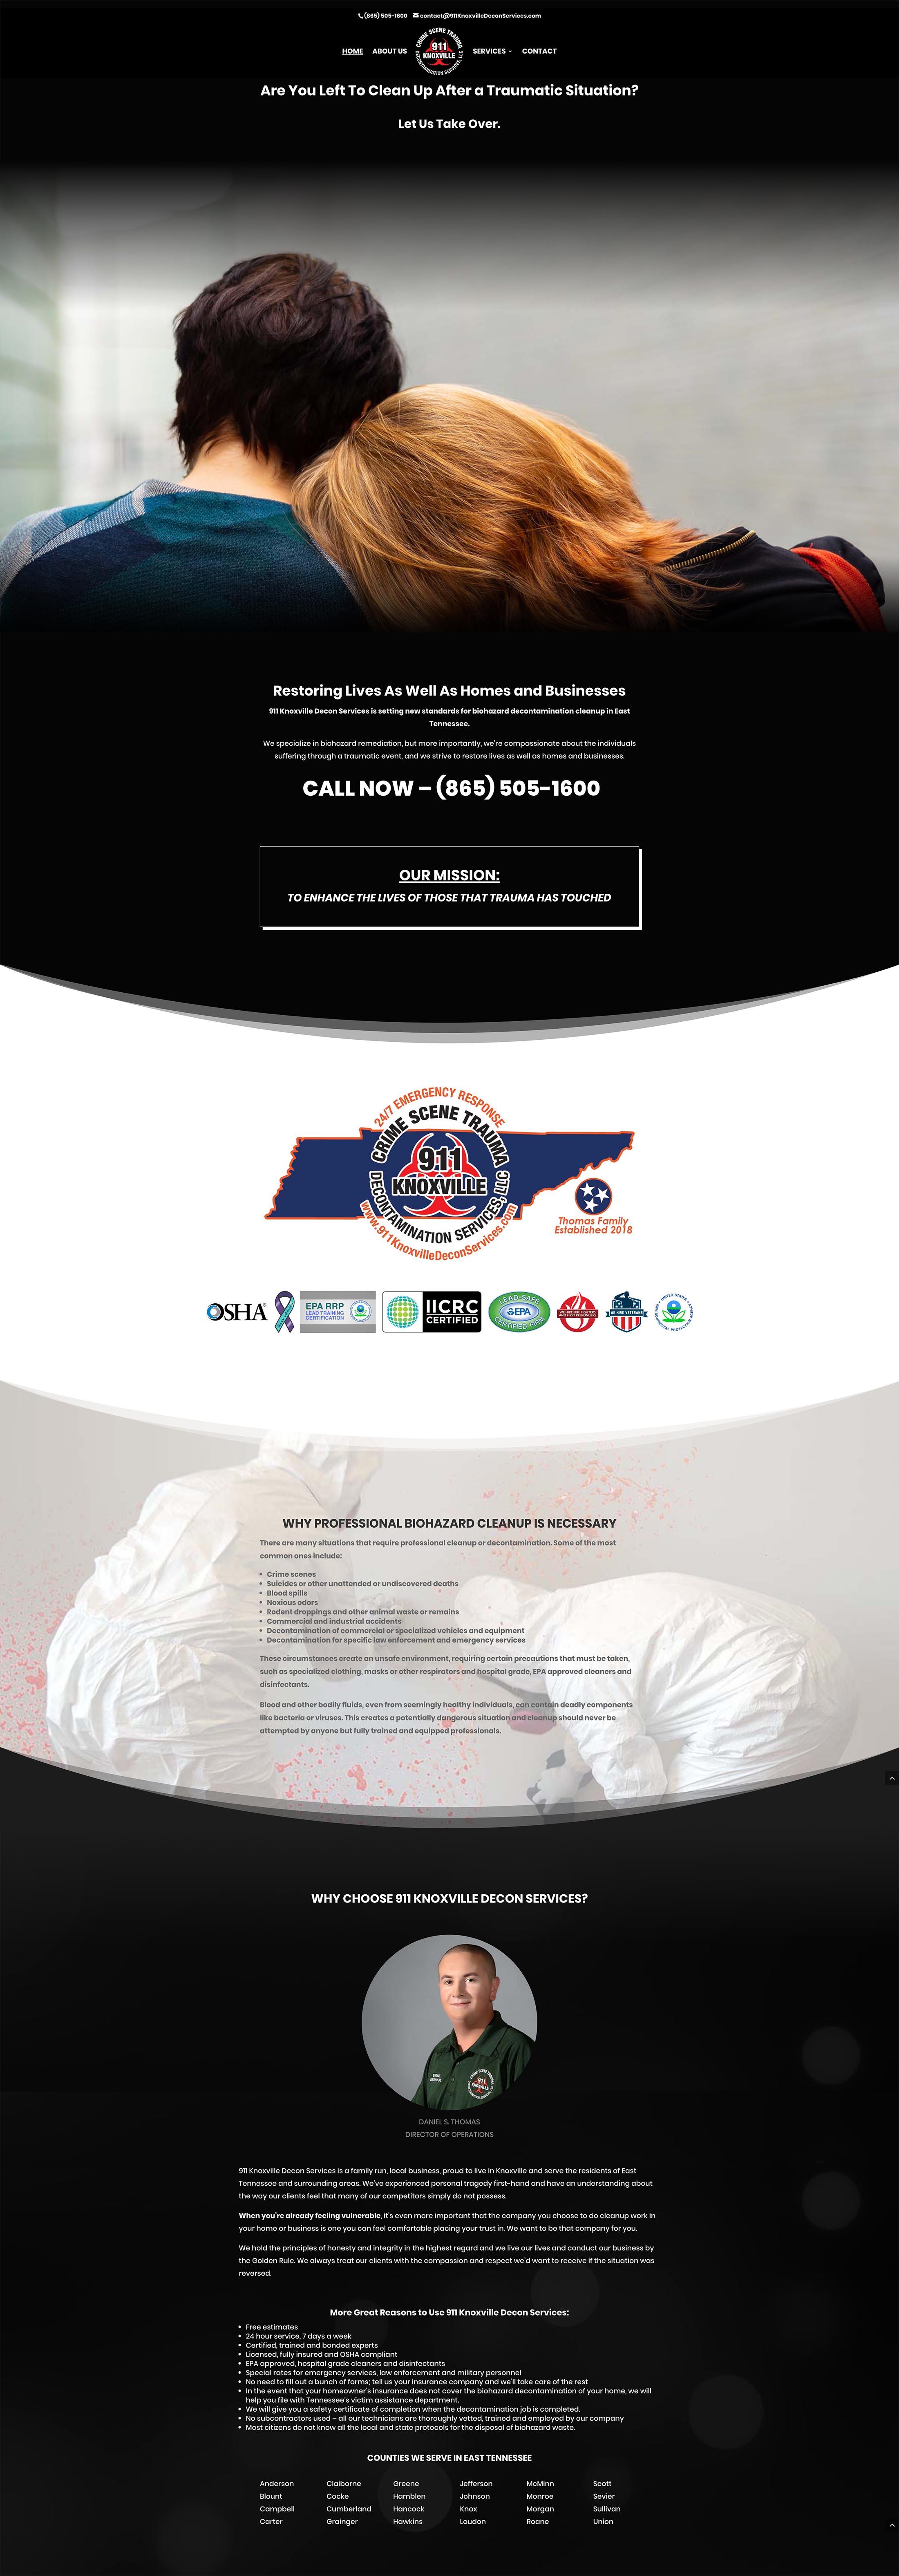 911 Decontamination Services Homepage Screenshot